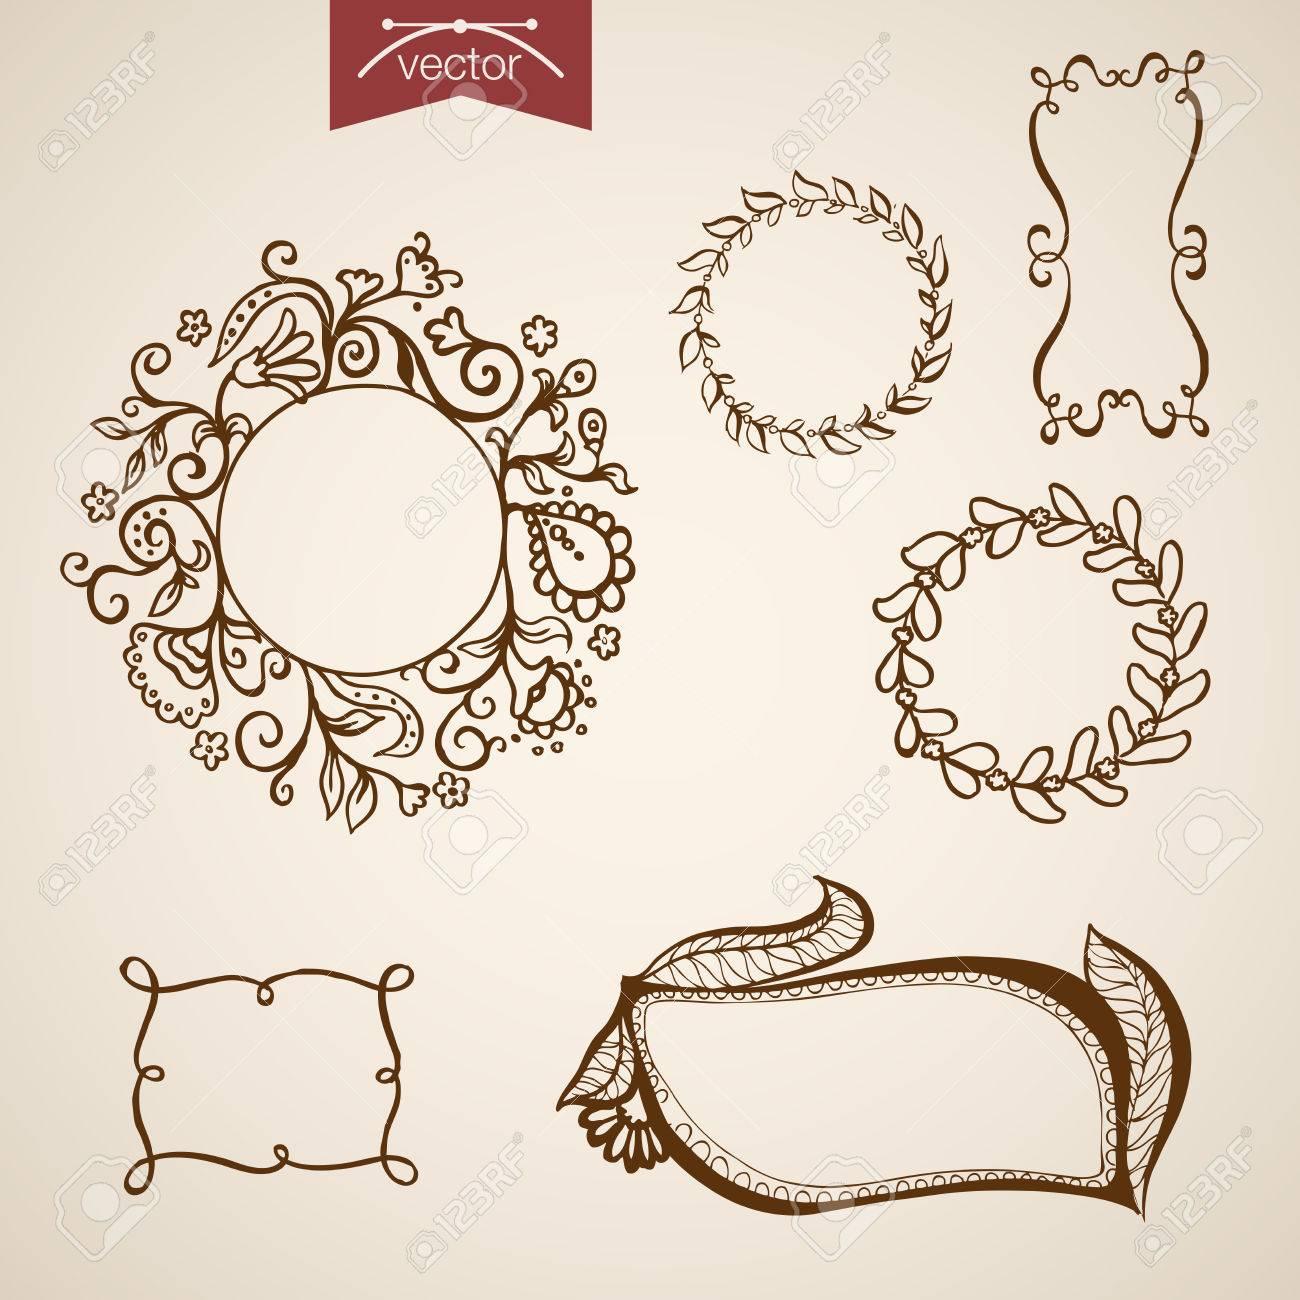 Engraving Vintage Hand Drawn Frames With Floral Elements Doodle ...